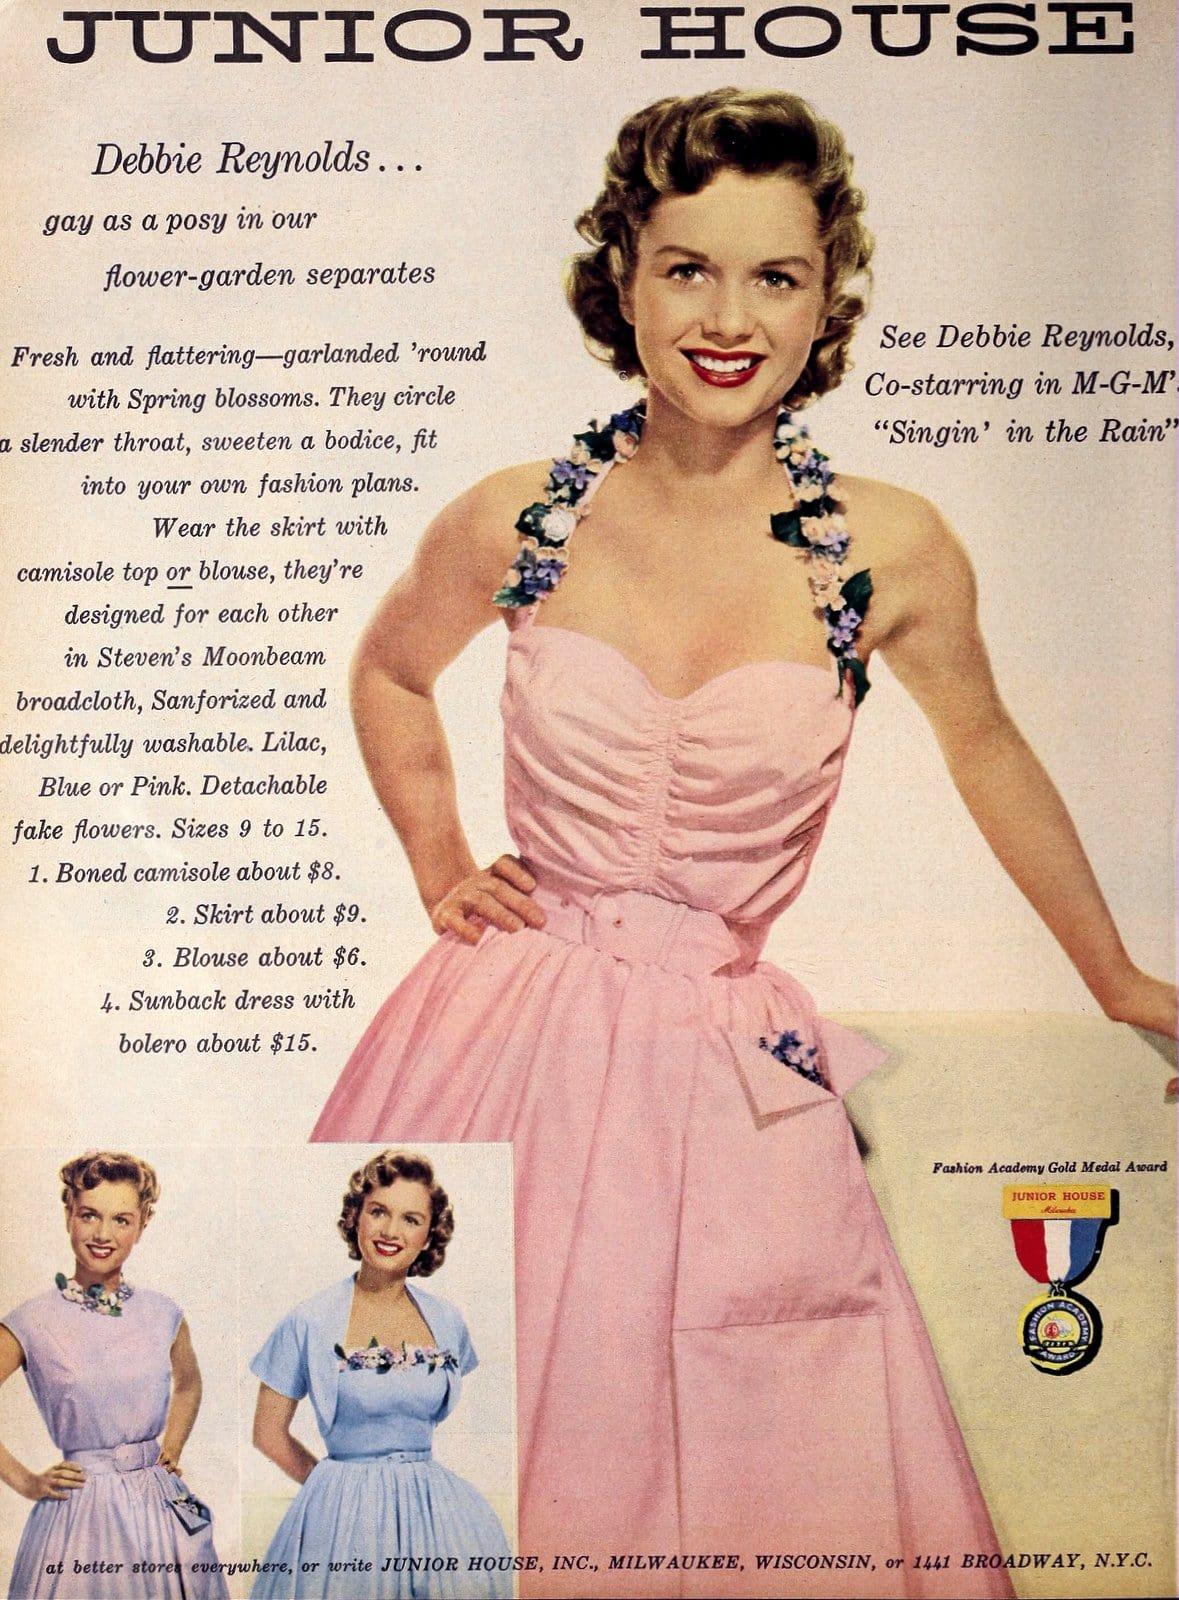 Debbie Reynolds for Junior House fashions (1952)